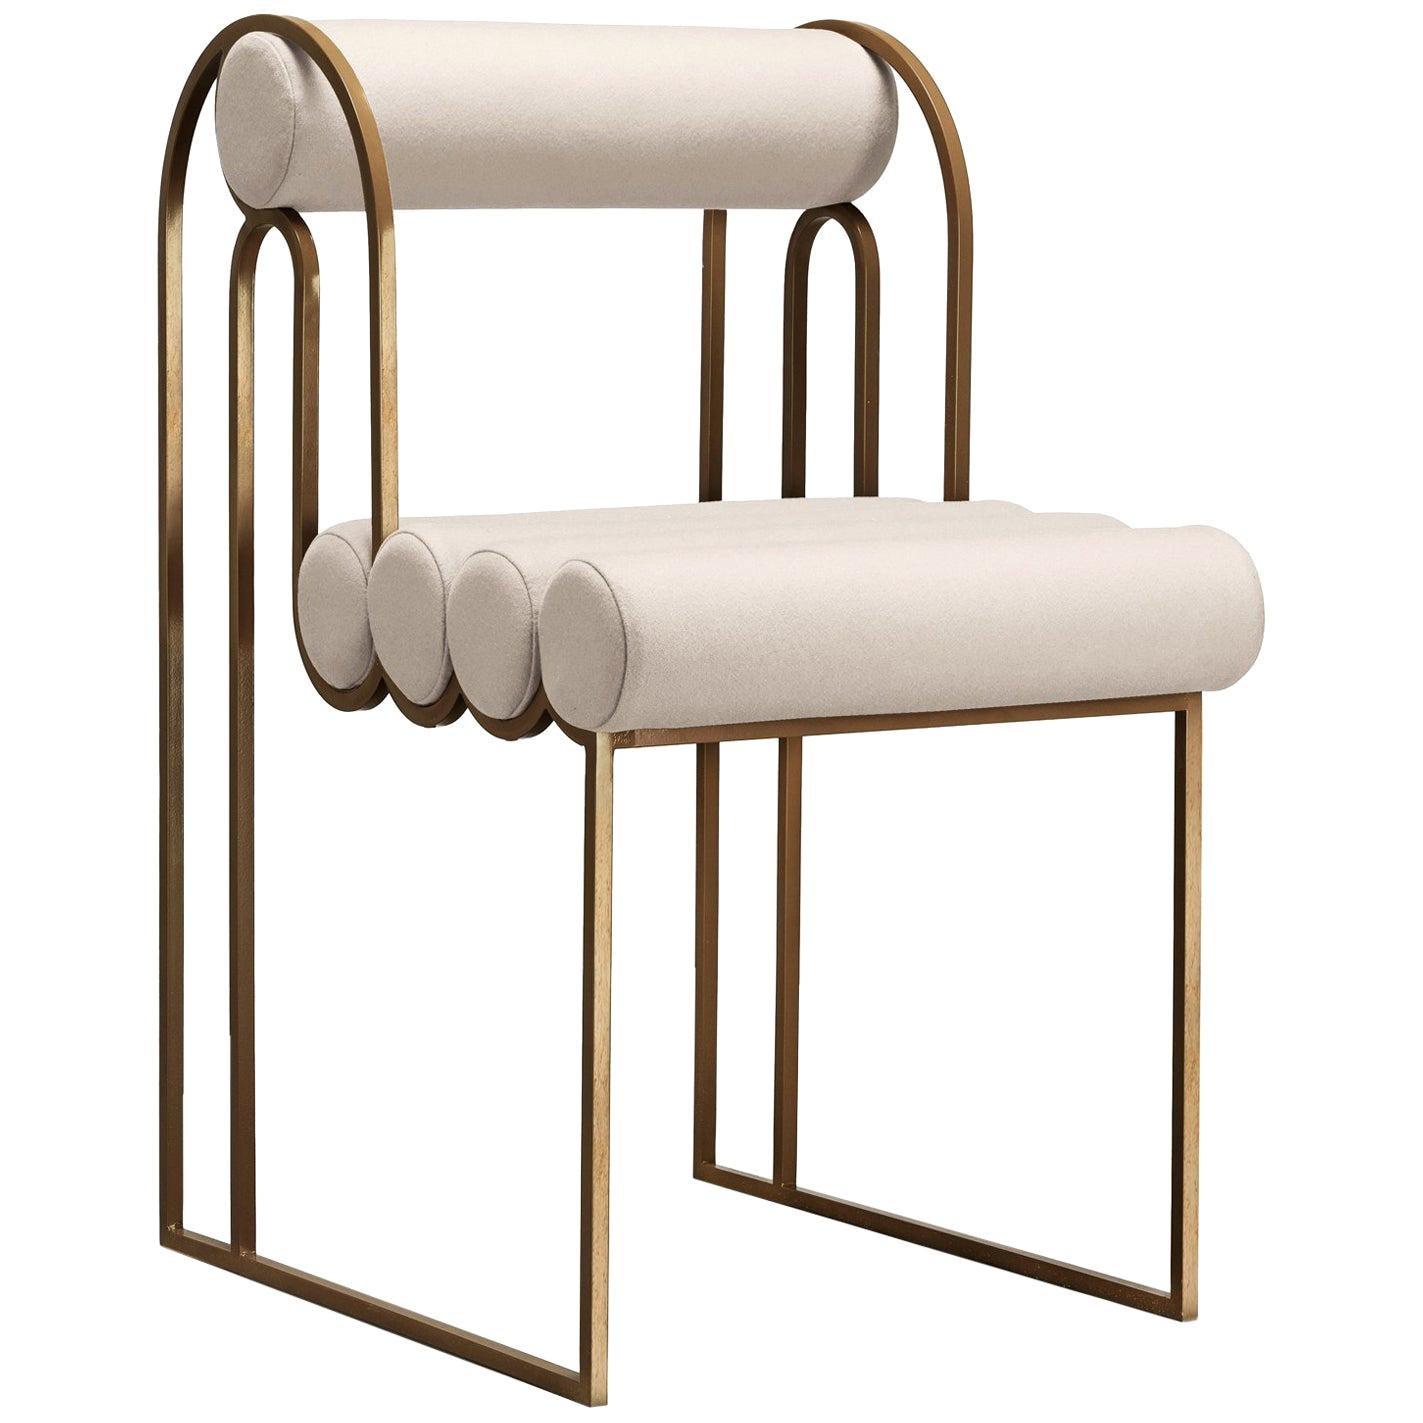 Apollo Dining Chair, Brass Frame and Cream Wool by Lara Bohinc